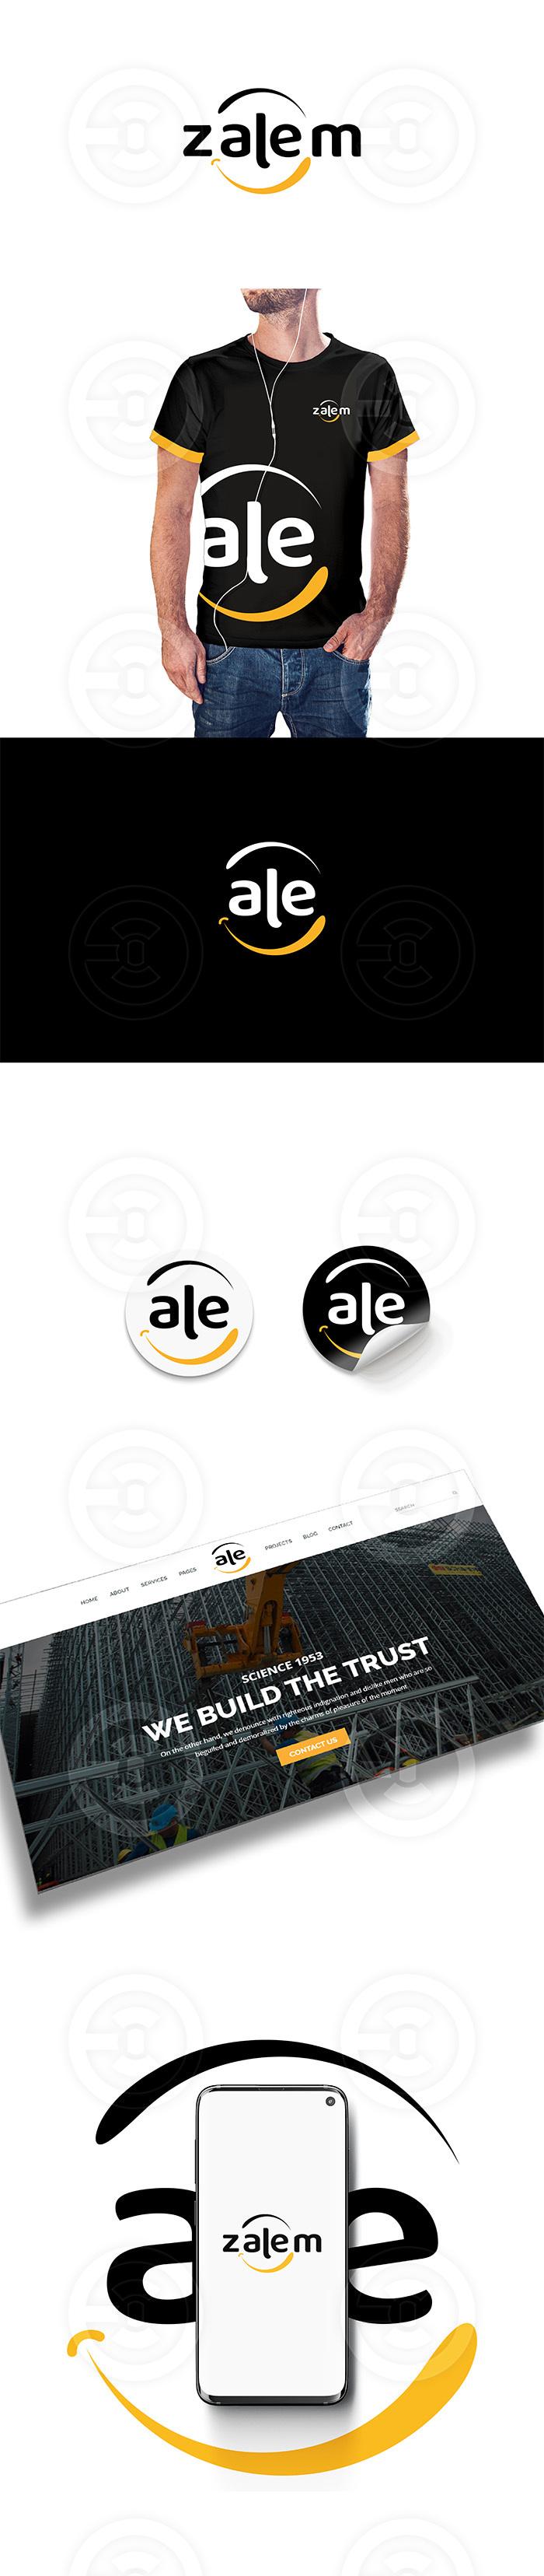 all_1.jpg